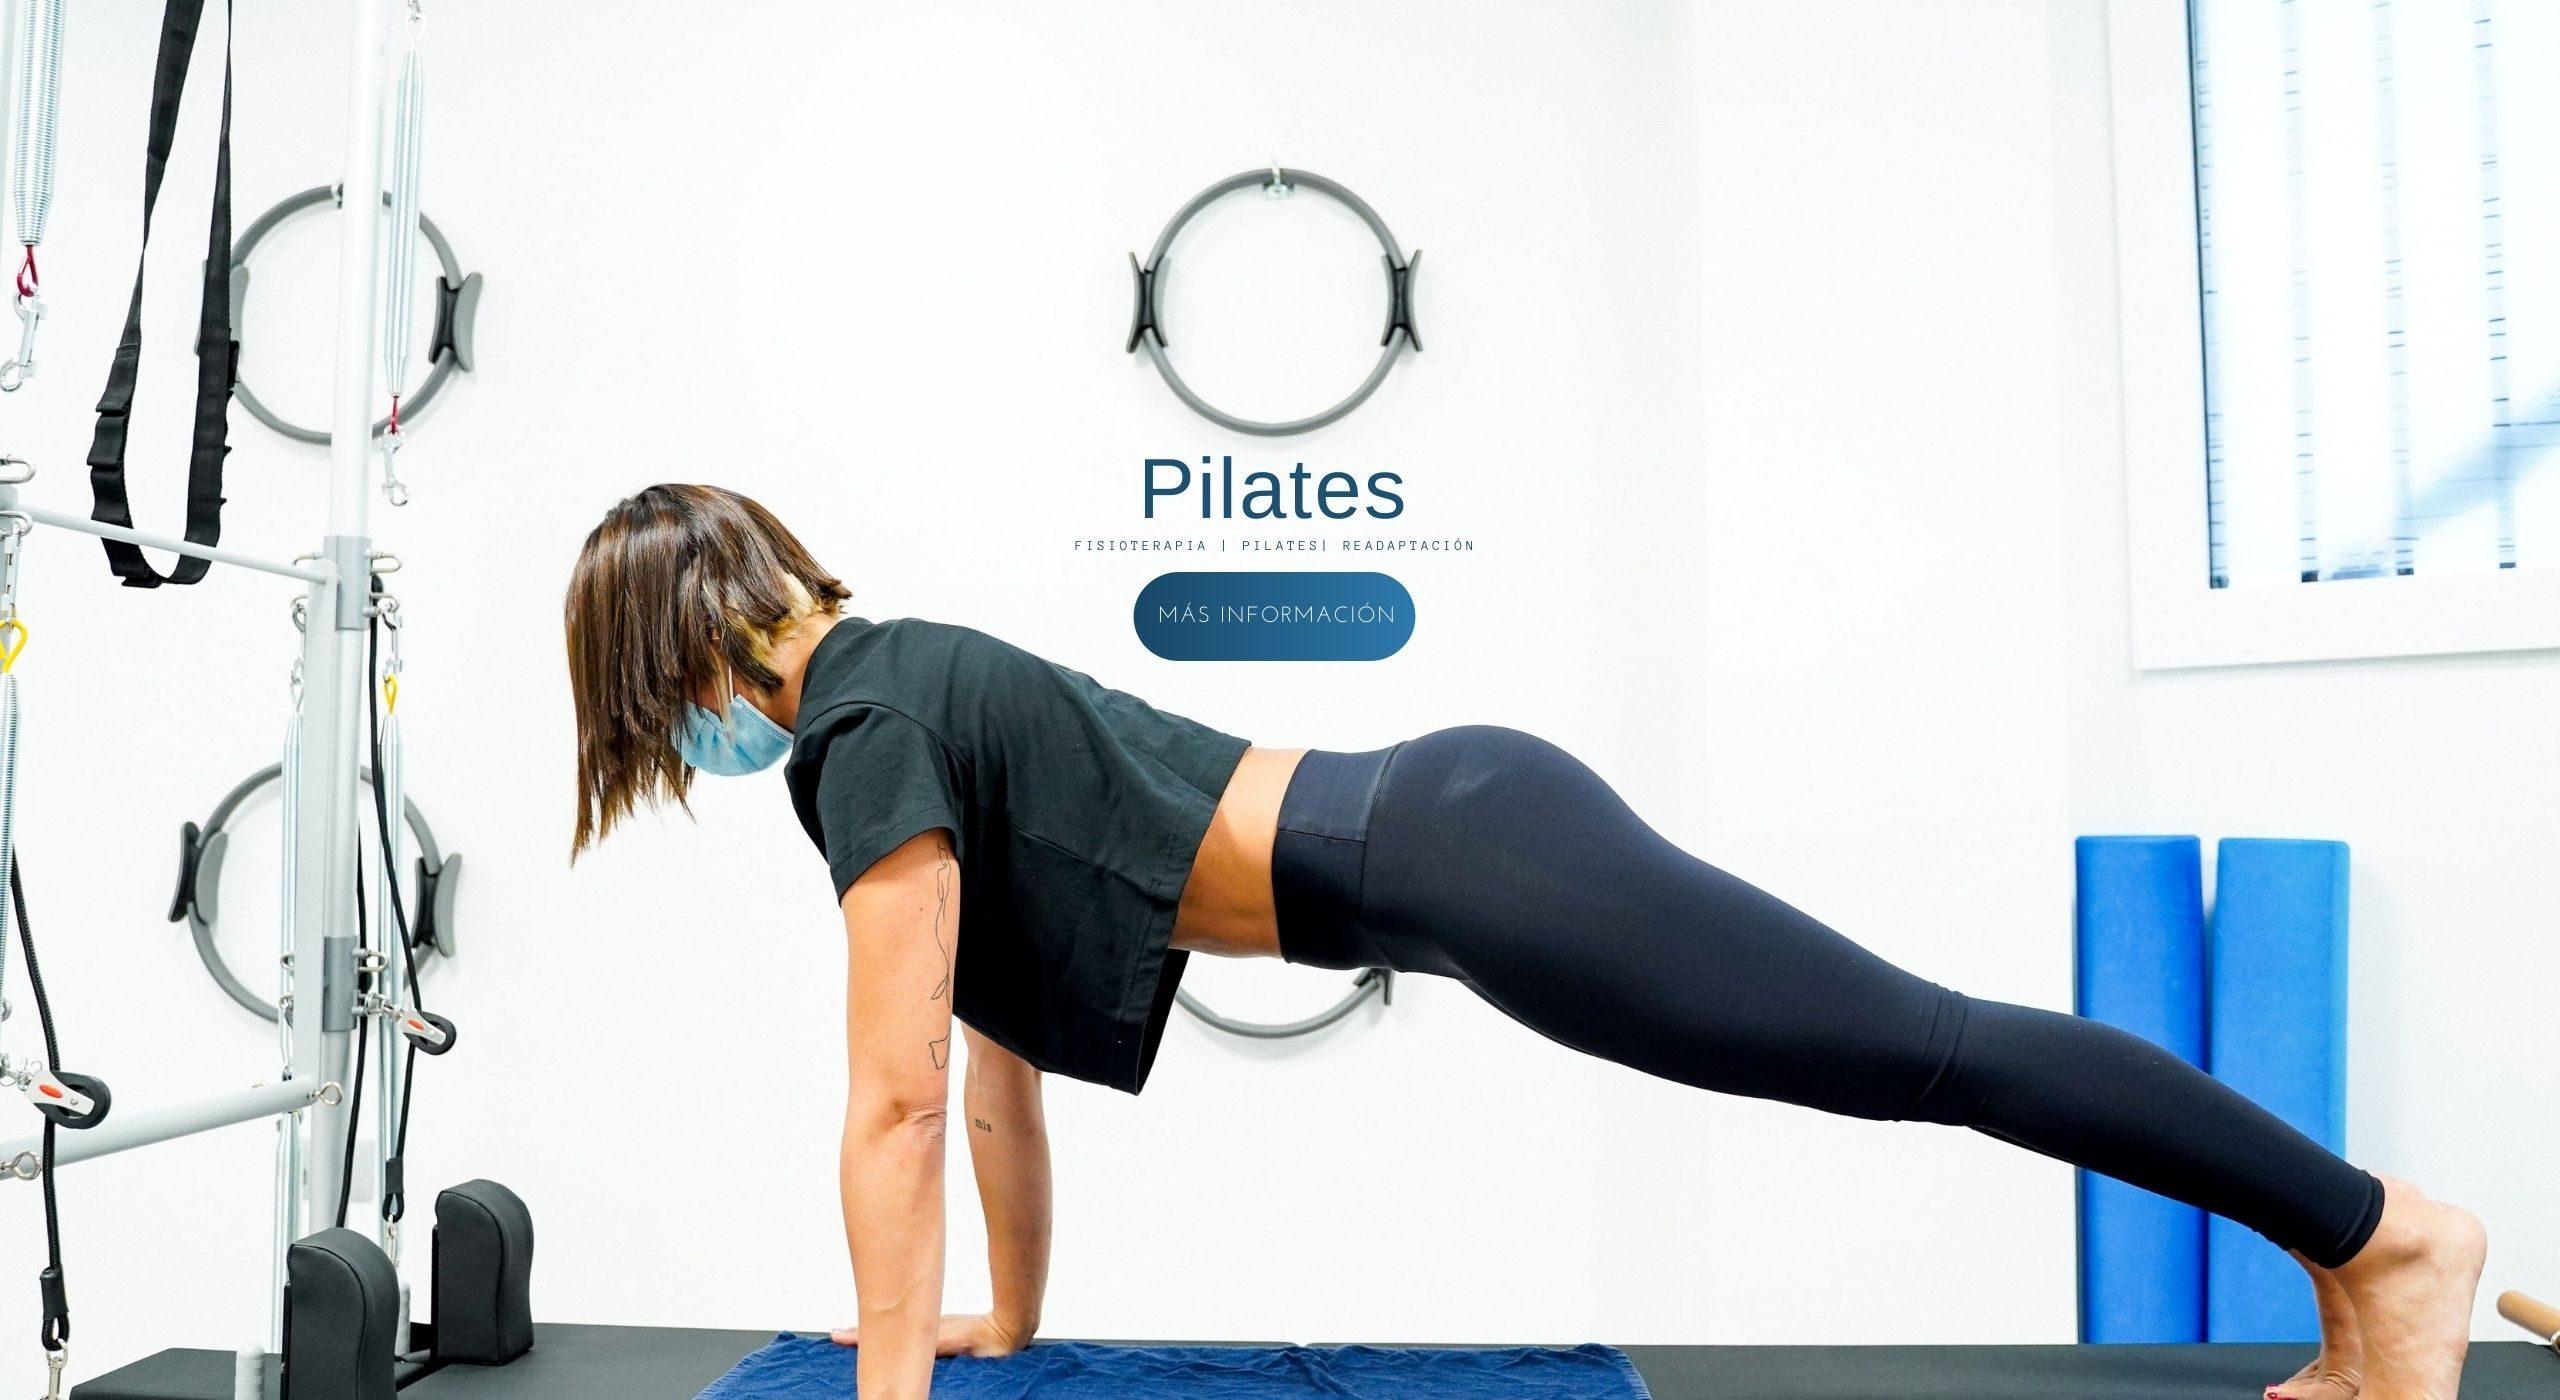 Fisioterapia avanzada en Tenerife Sur. Pilates con reformer en Tenerife Sur   Physiotherapy Tenerife, Pilates Tenerife South